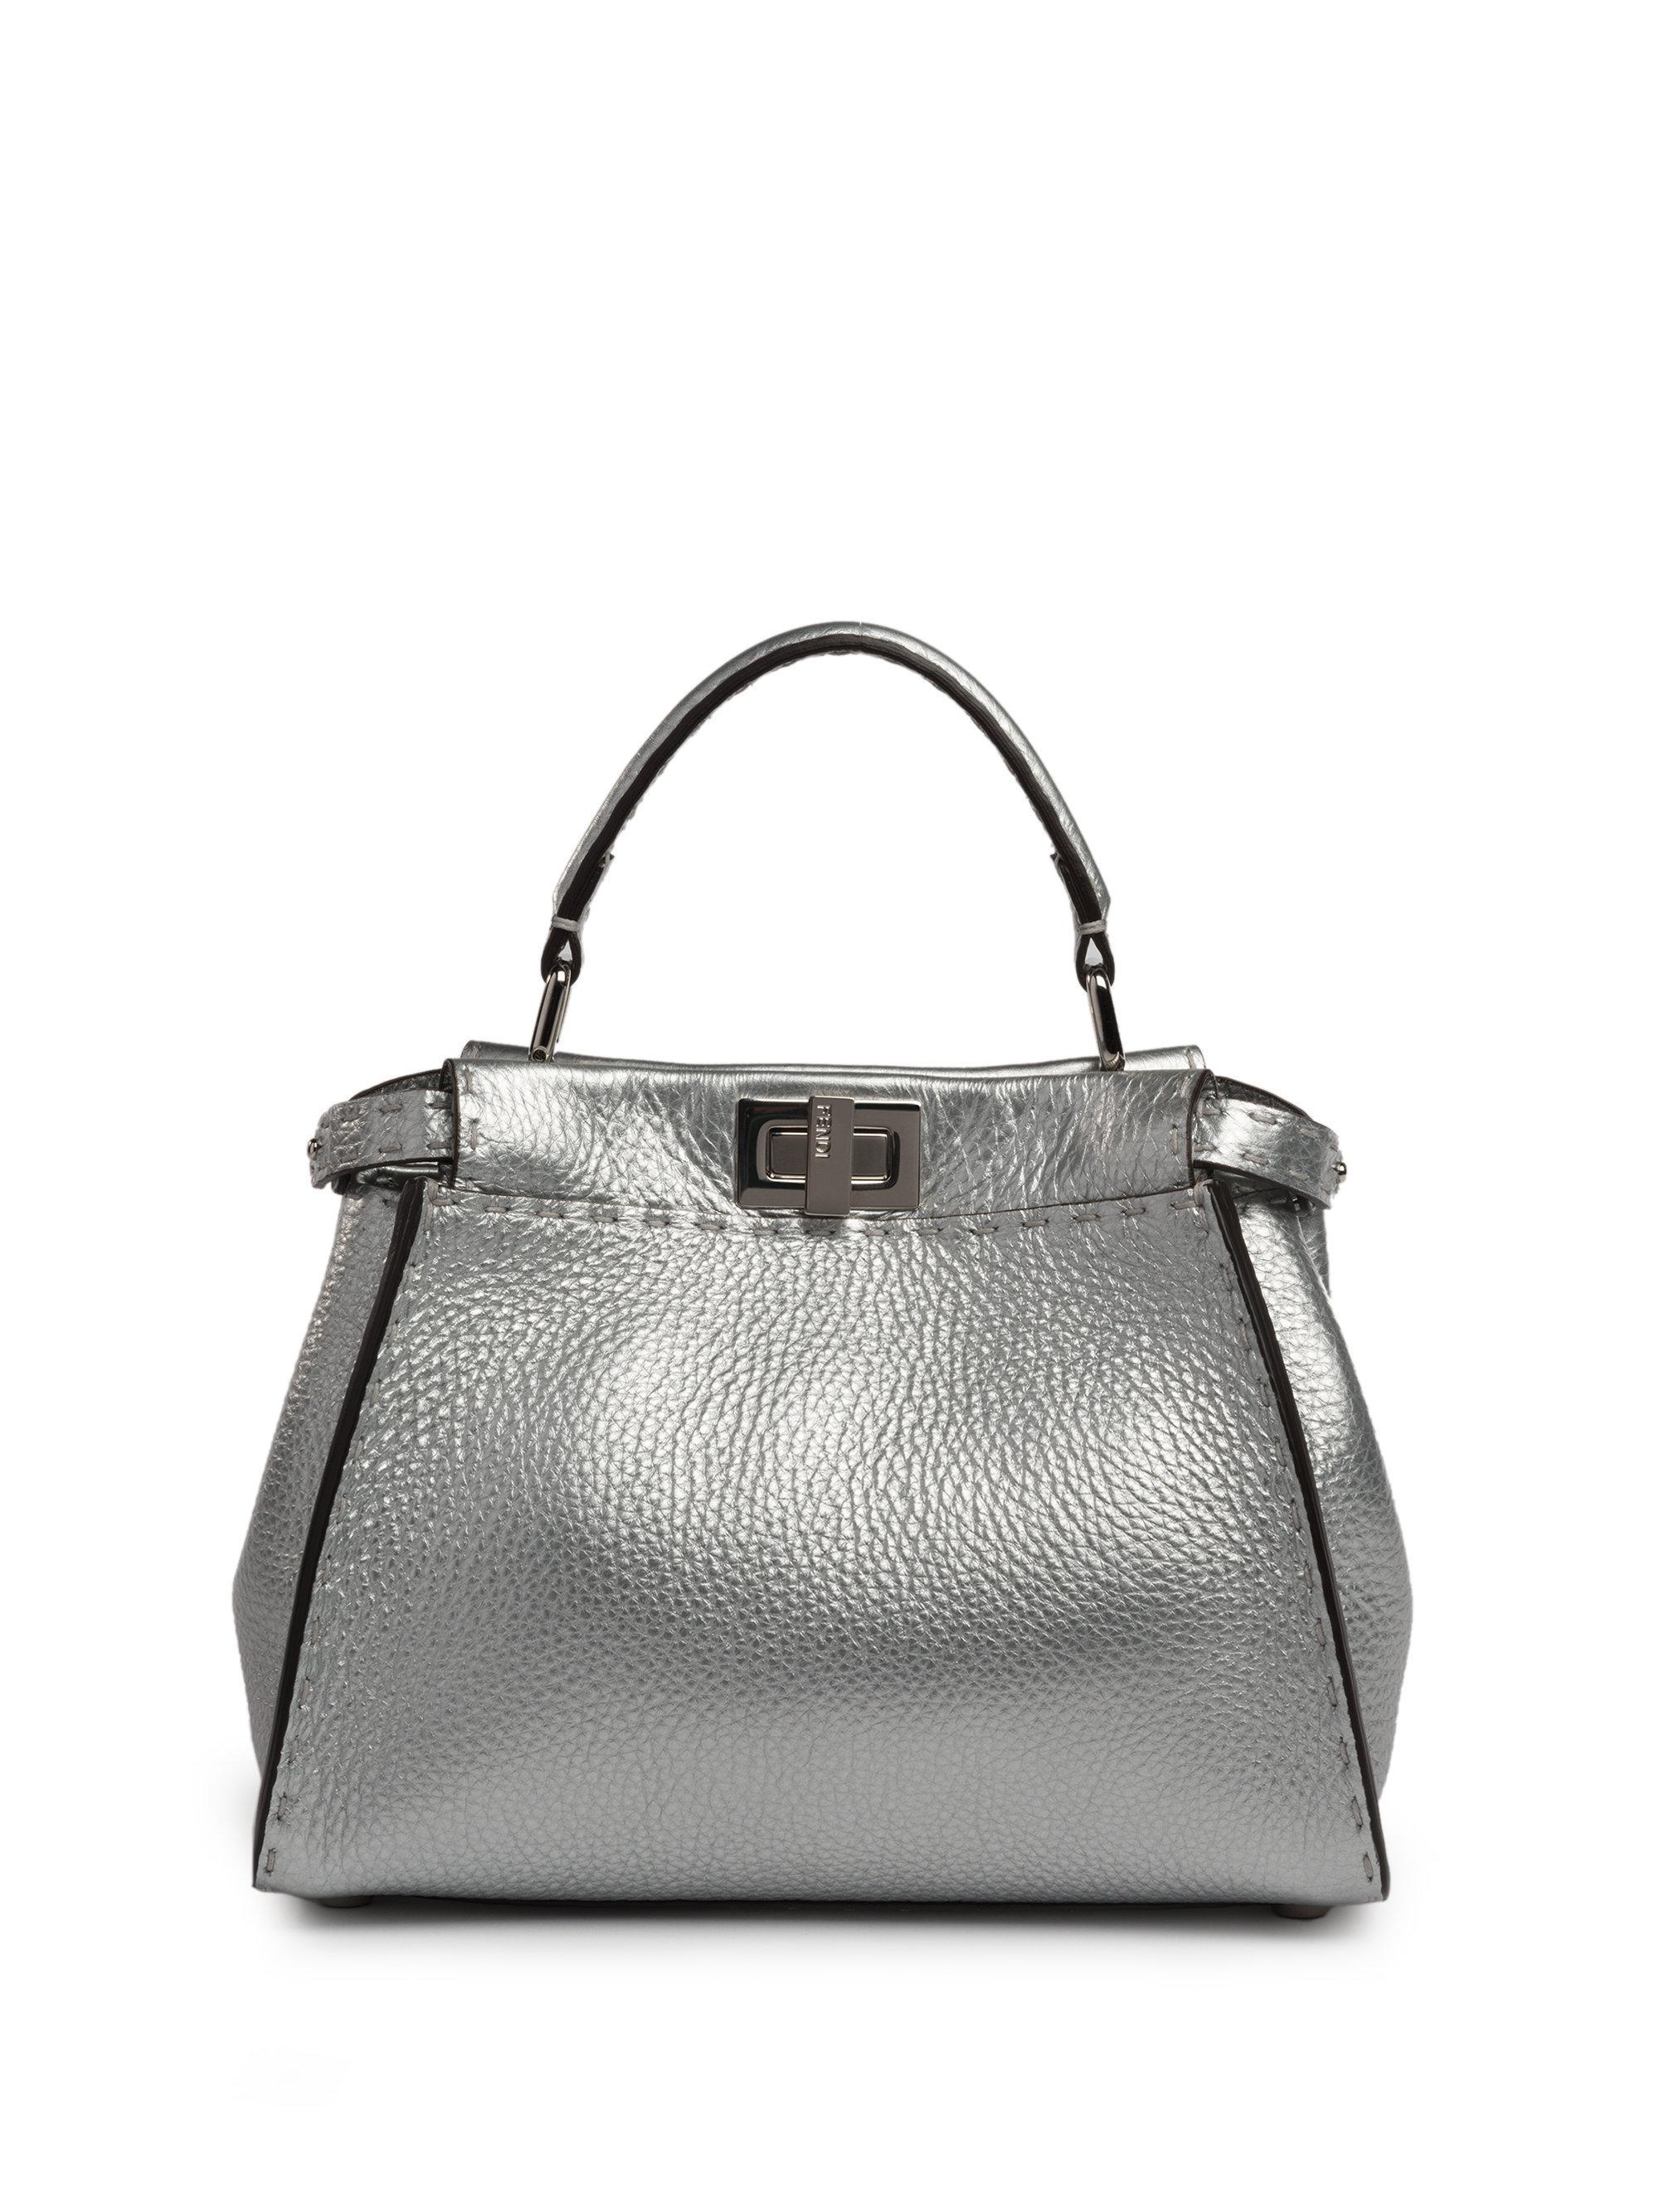 635b22db04ac ... germany lyst fendi selleria peekaboo mini metallic leather satchel in  metallic 53e67 5bf6a